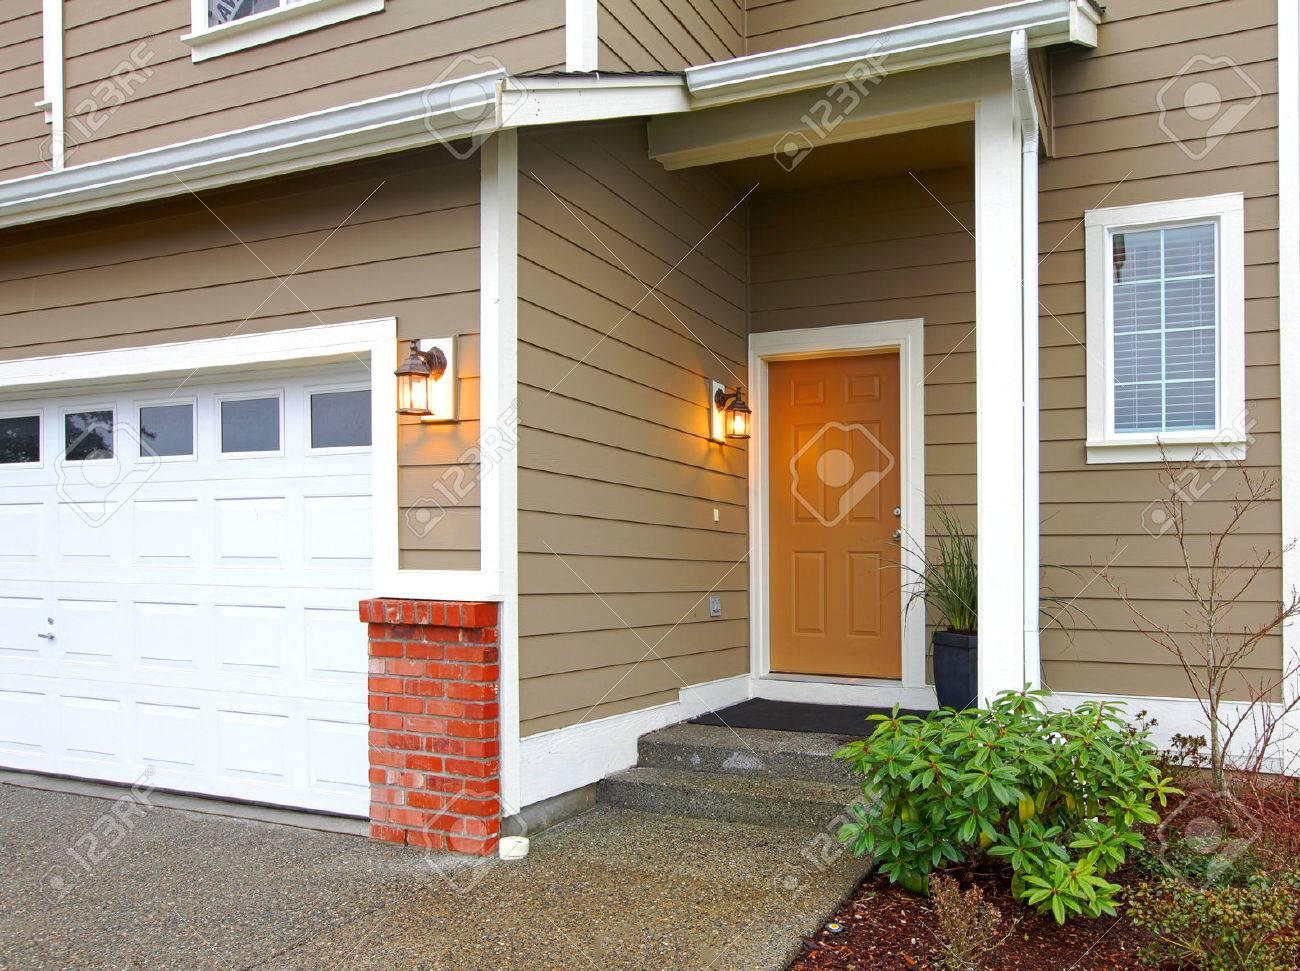 Garage Bilder view ot the entrance orange door and garage form a walkway royalty